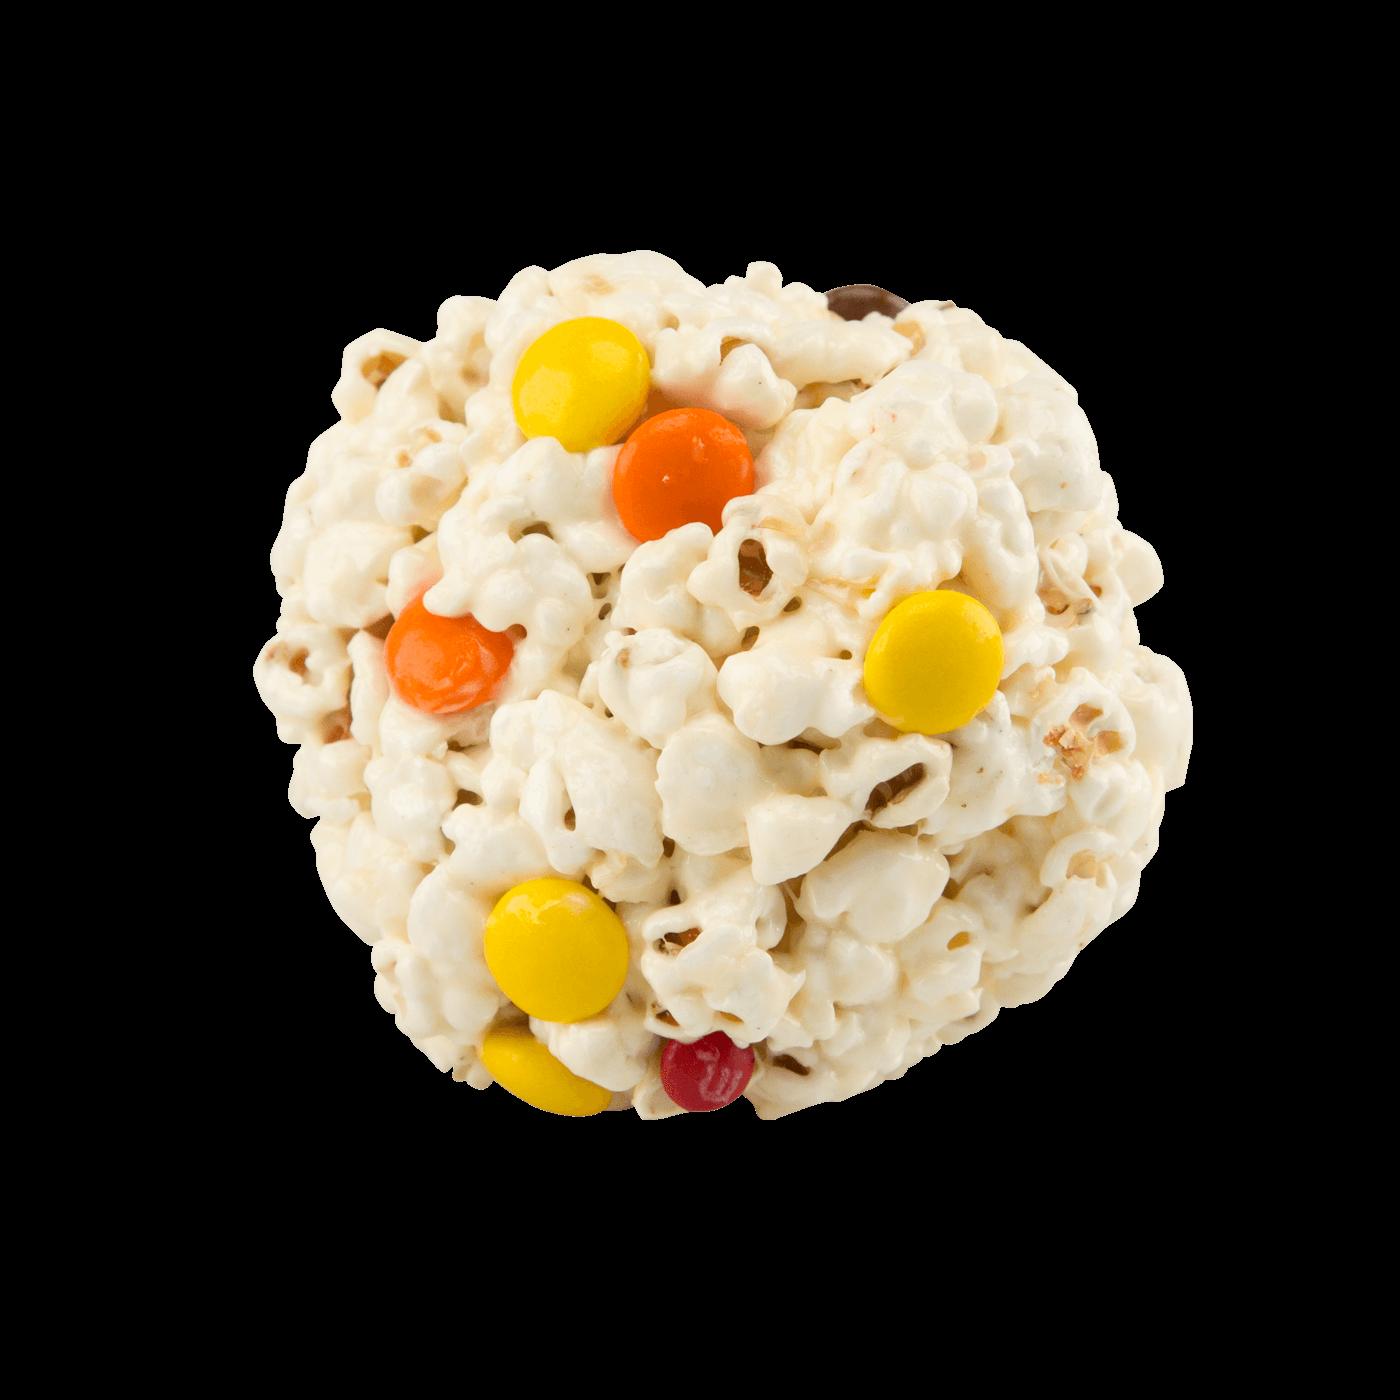 Farmer Jon's Popcorn Balls with Reese's